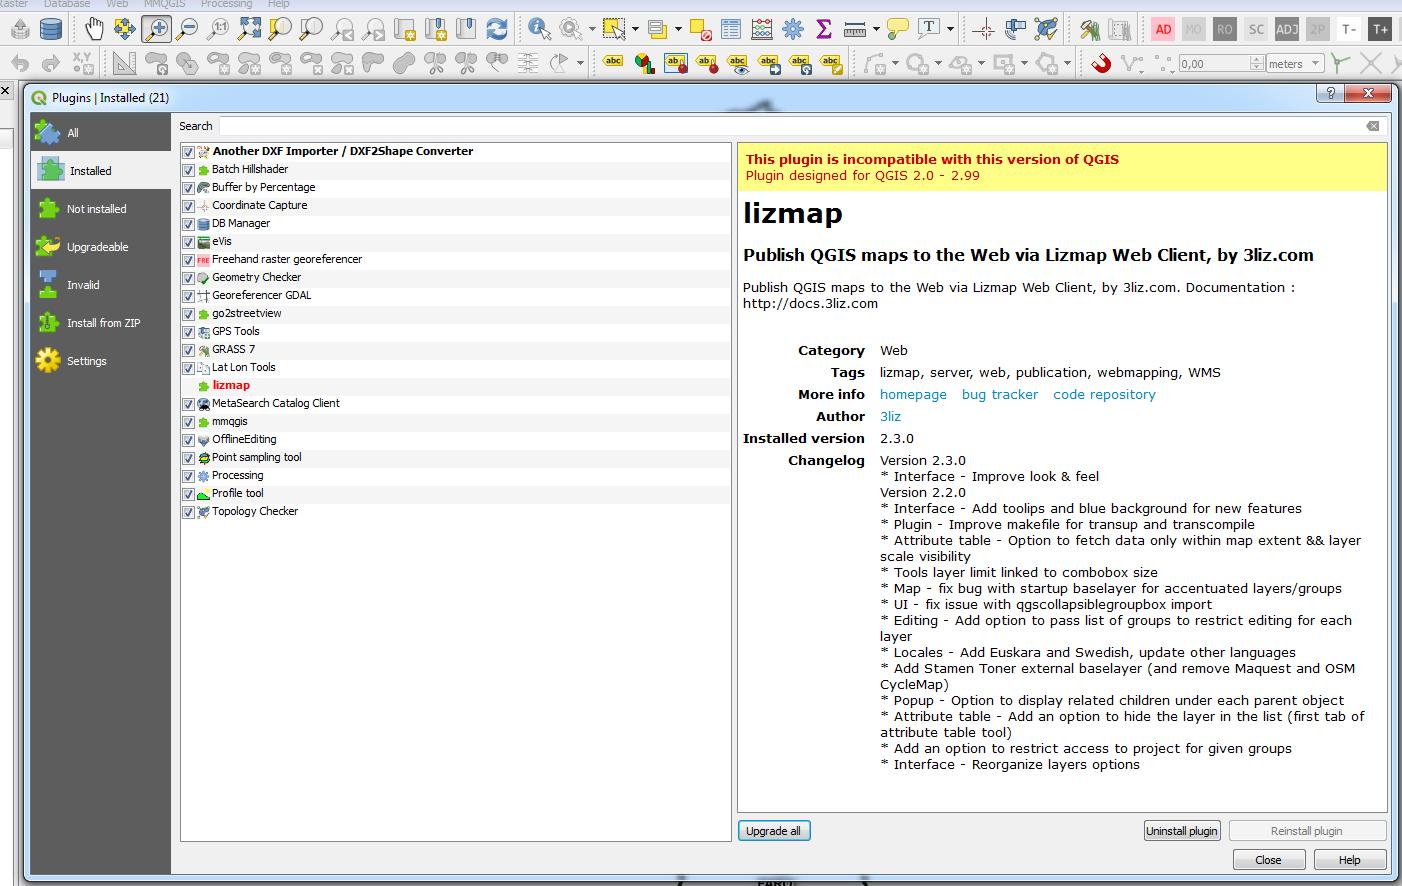 Qgis 3 0 - LIZMAP incompatible version · Issue #91 · 3liz